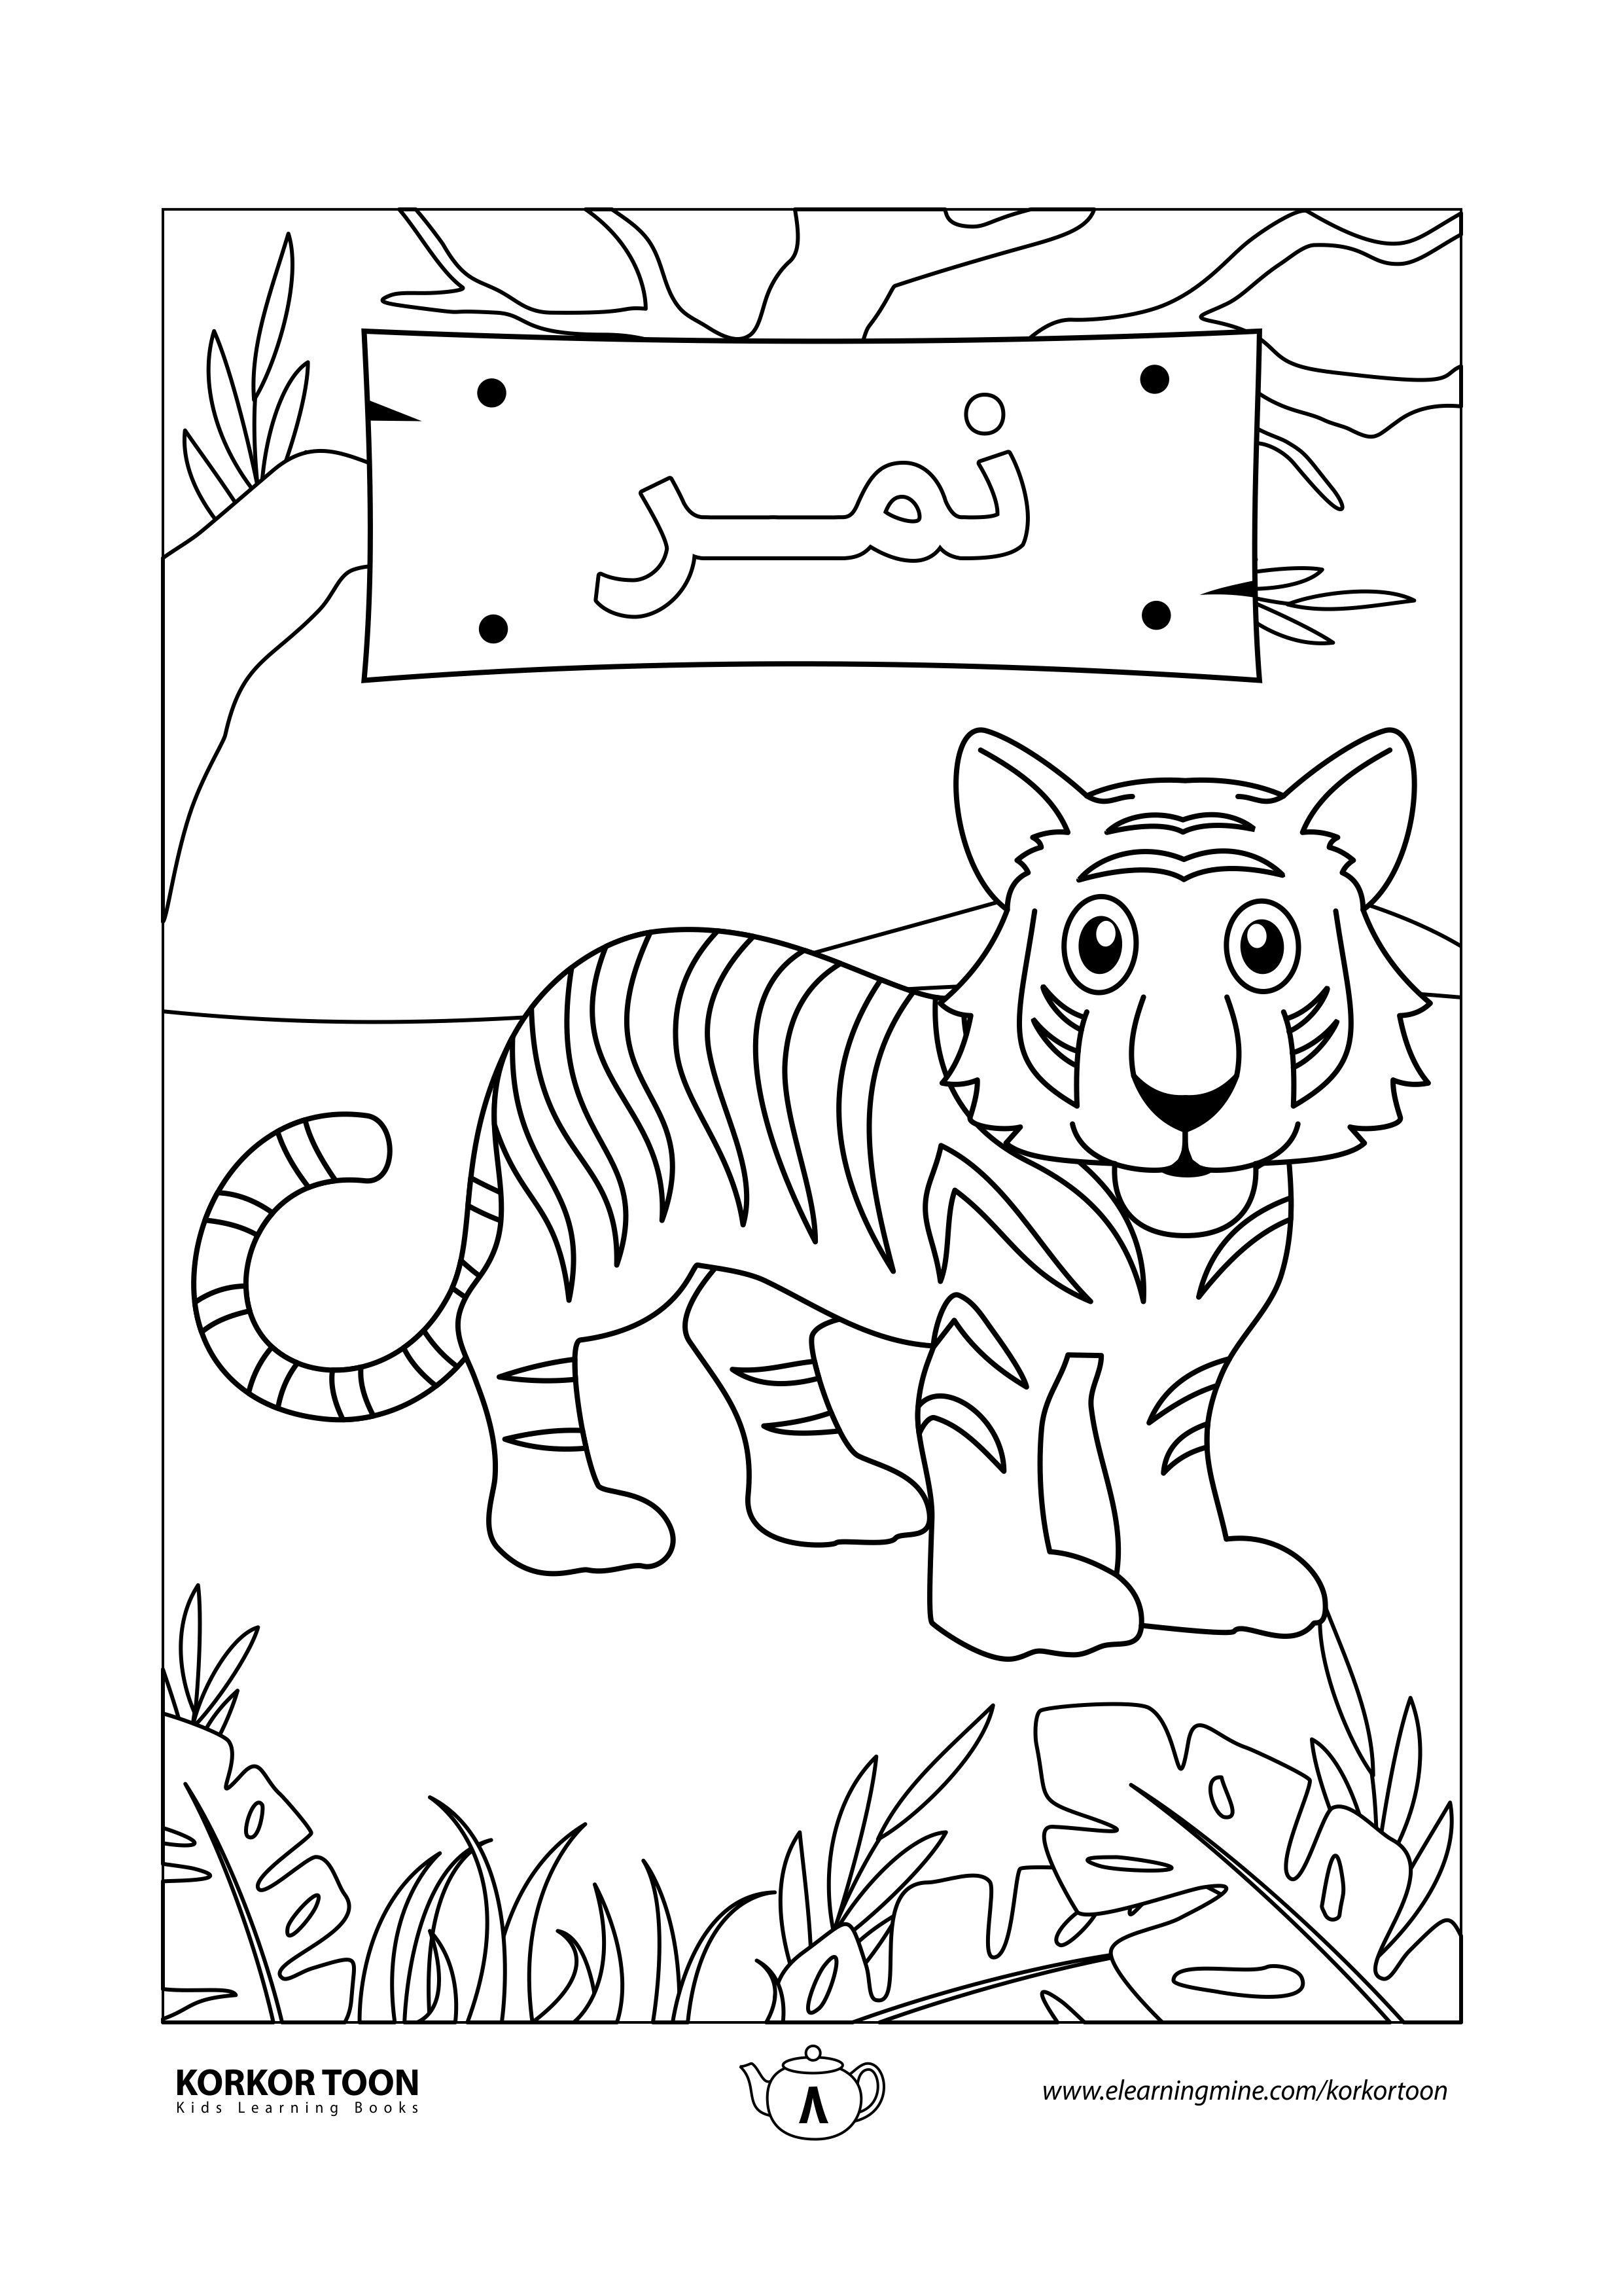 كتاب تلوين حيوانات الغابة صفحة تلوين النمر In 2021 Coloring Books Animal Coloring Books Applique Patterns